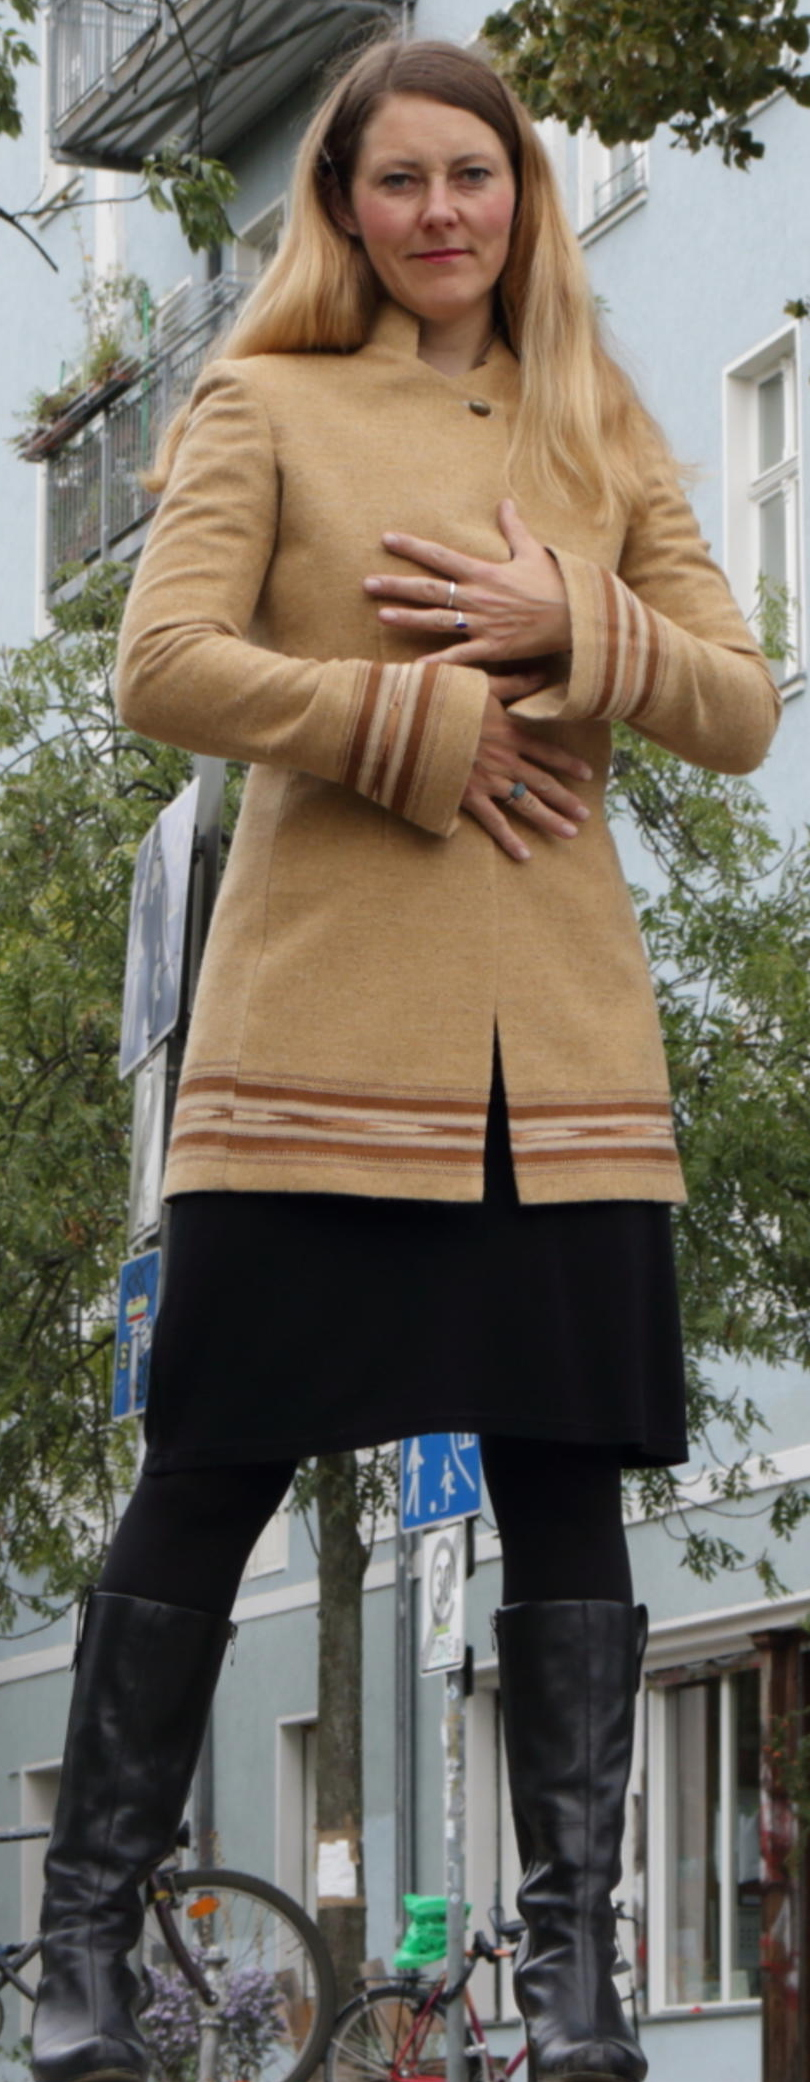 long jacket ade of patu material